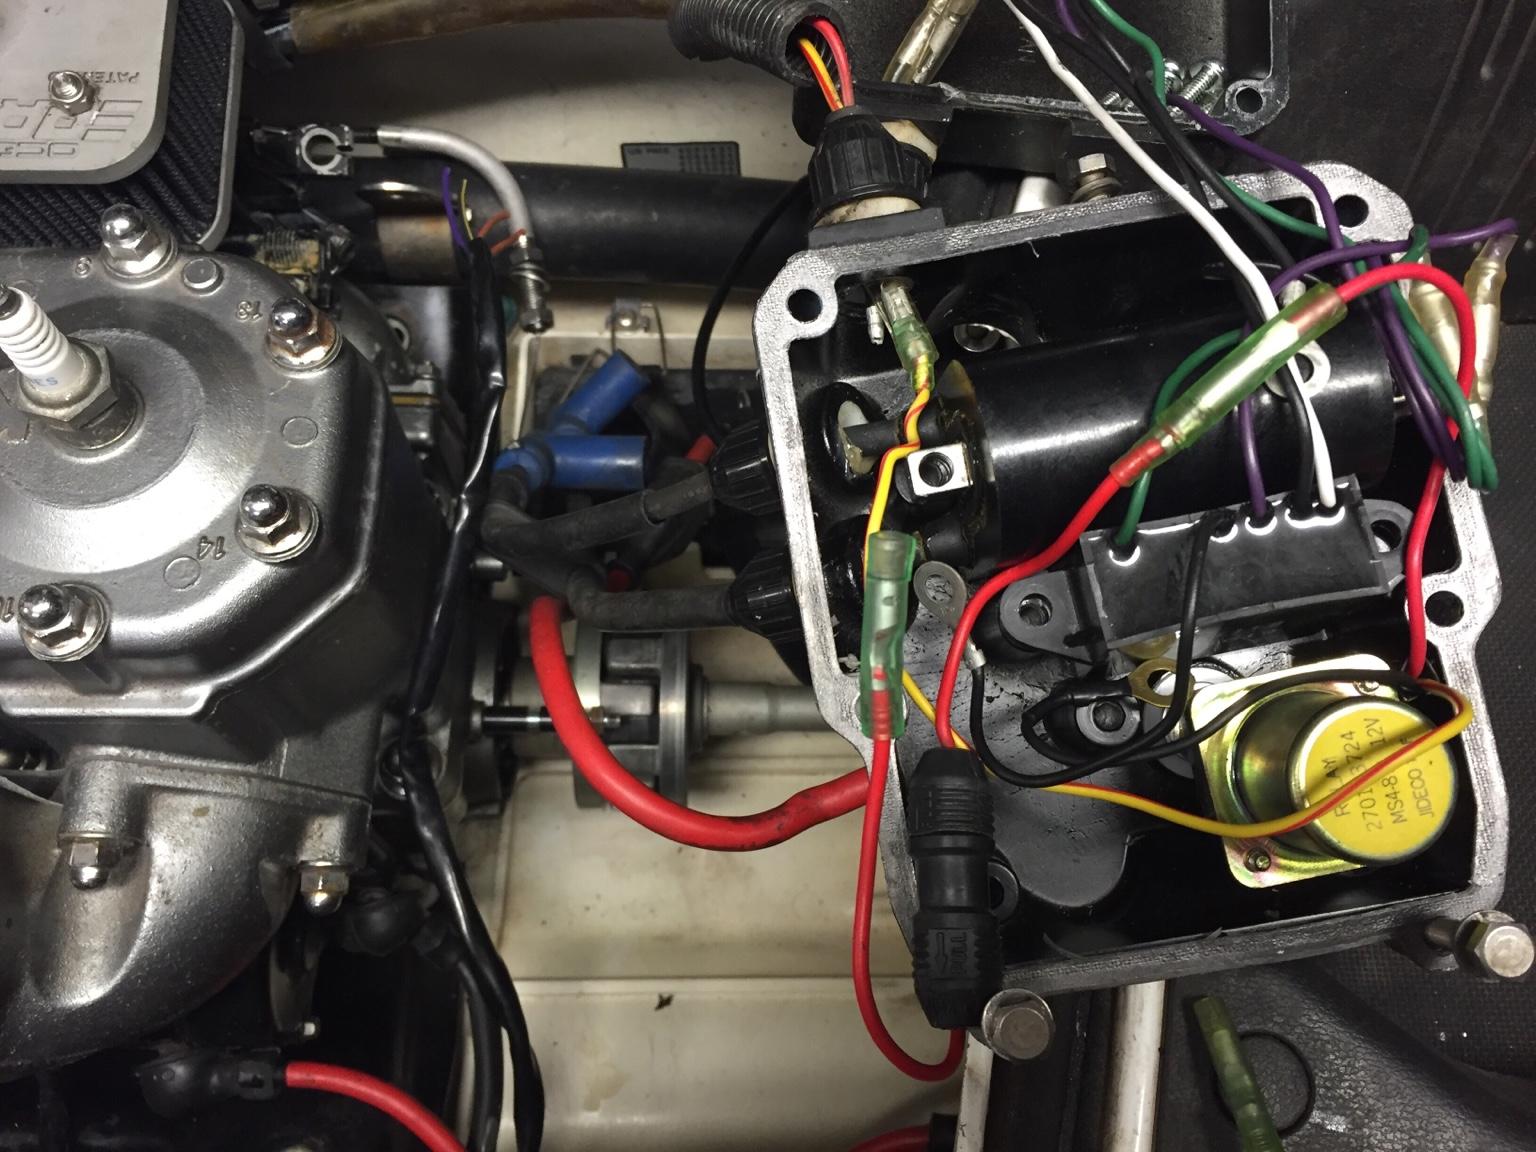 hight resolution of 550sx 650 conversion wiring kawasaki 550 sx wiring diagram kawasaki 550 sx wiring diagram source kawasaki 550 jet ski